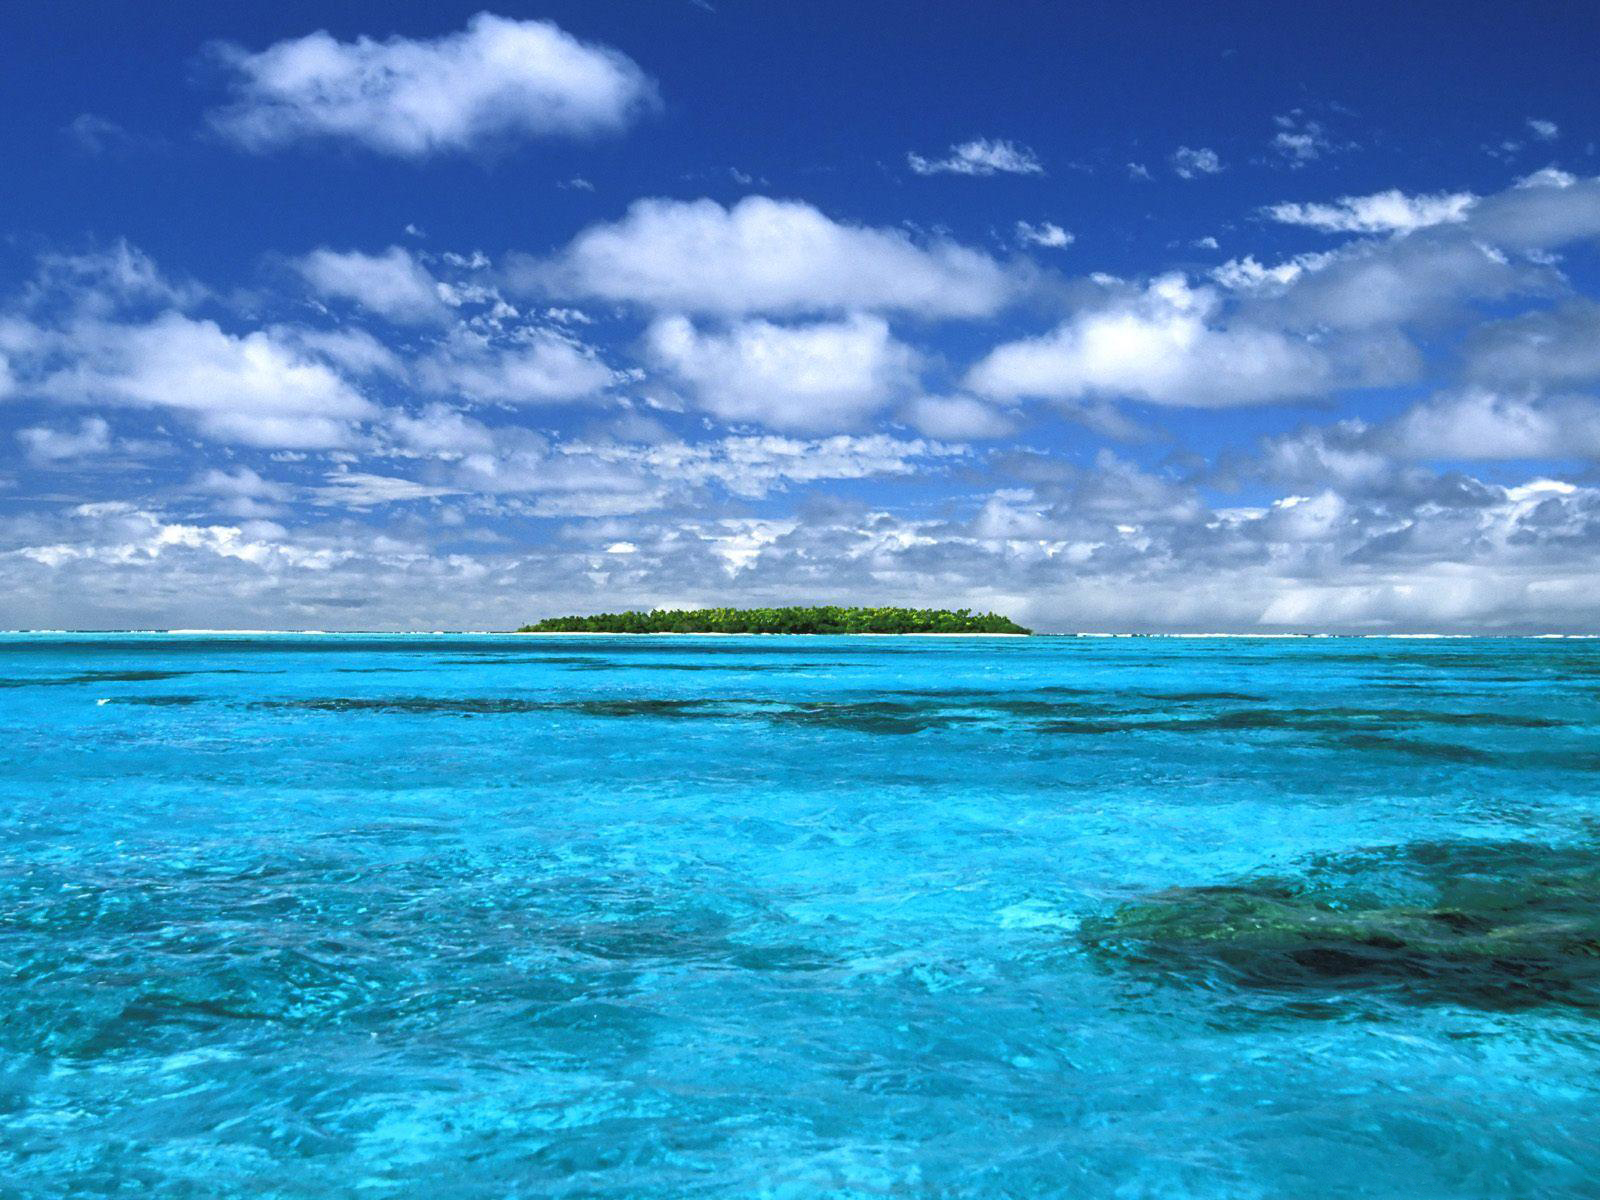 island wallpaper | islands wallpapers | tropical wallpaper | island ...